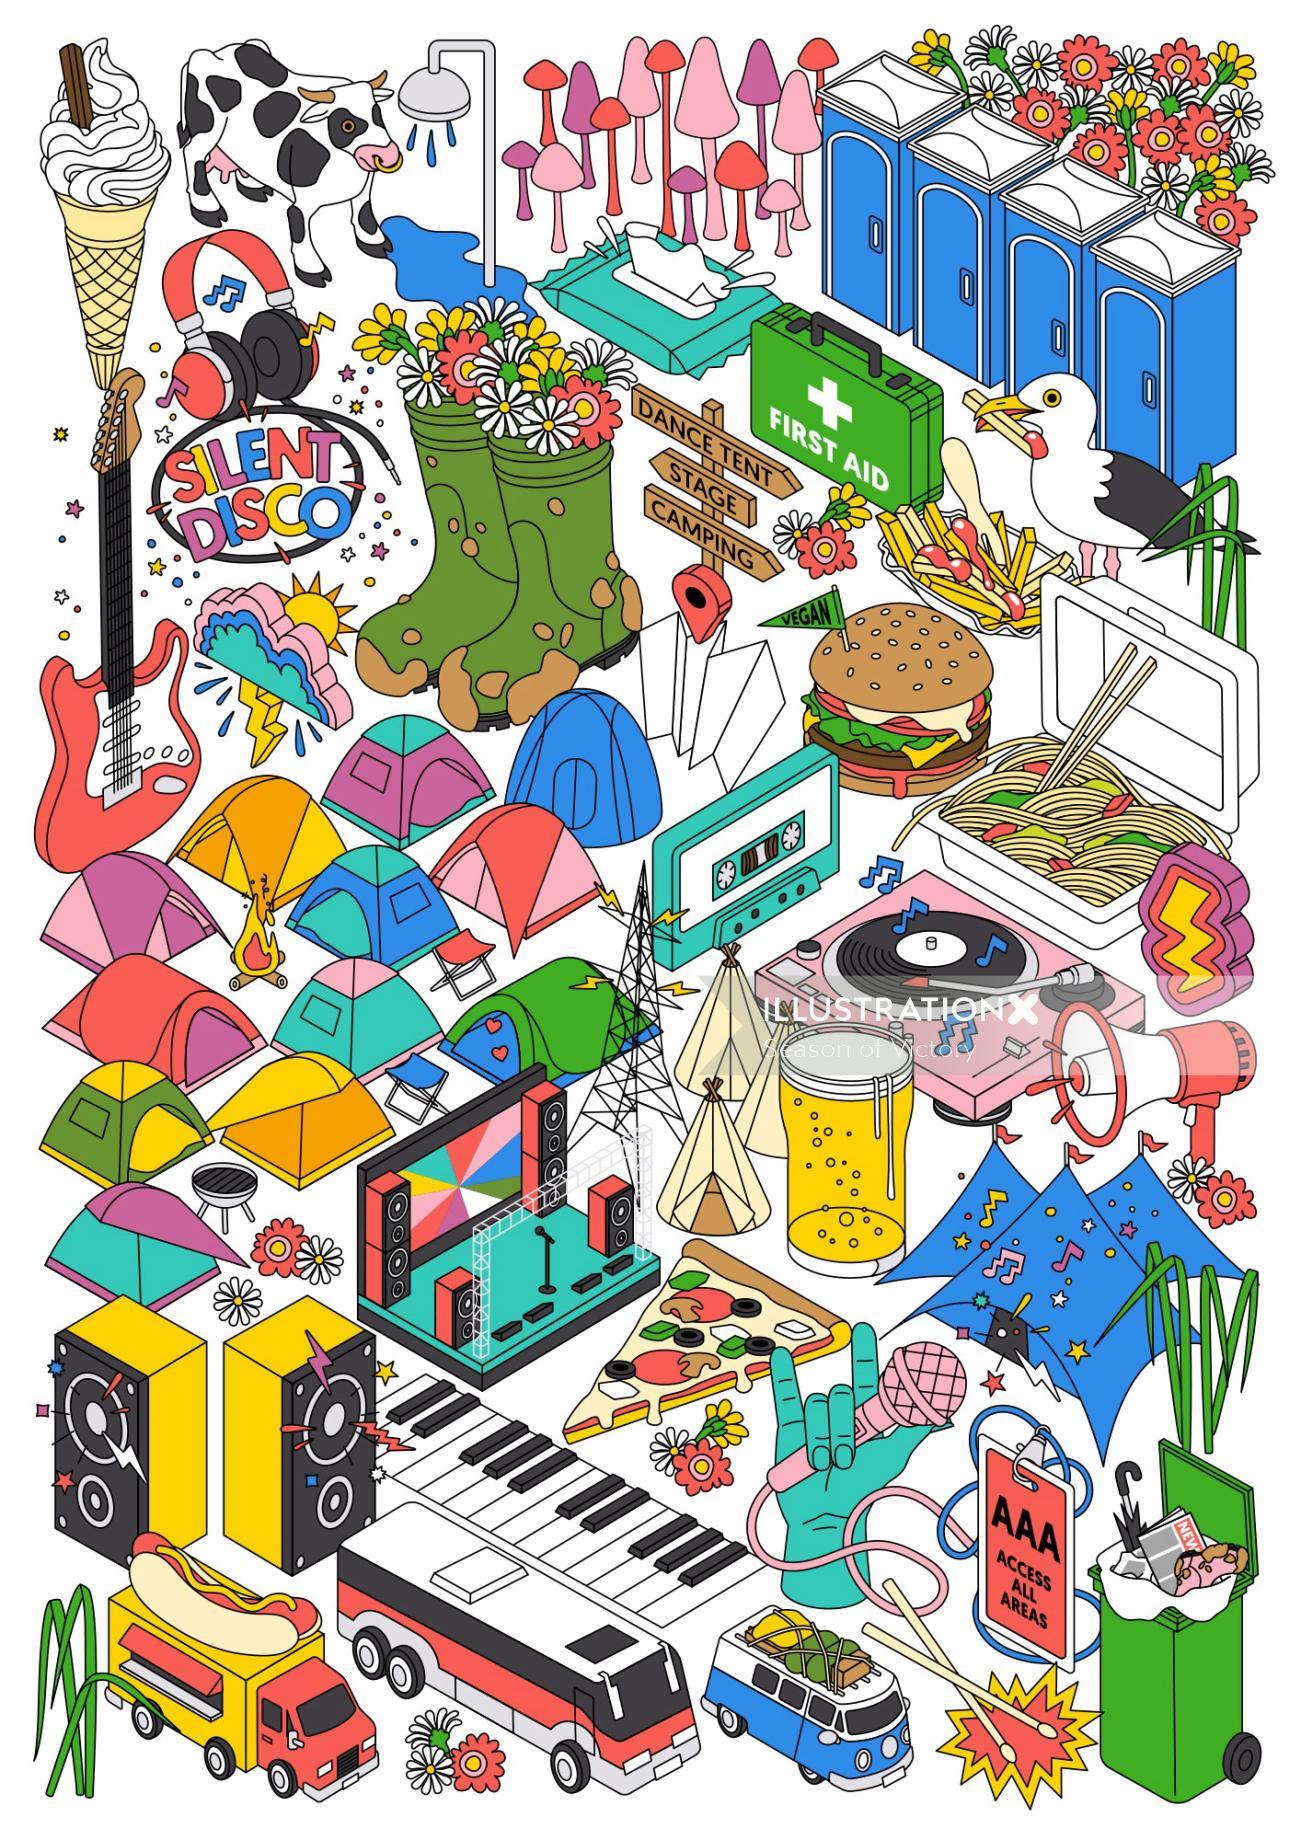 festival, music festival, food festival, food, summer, beach, isometric illustration, isometric map,